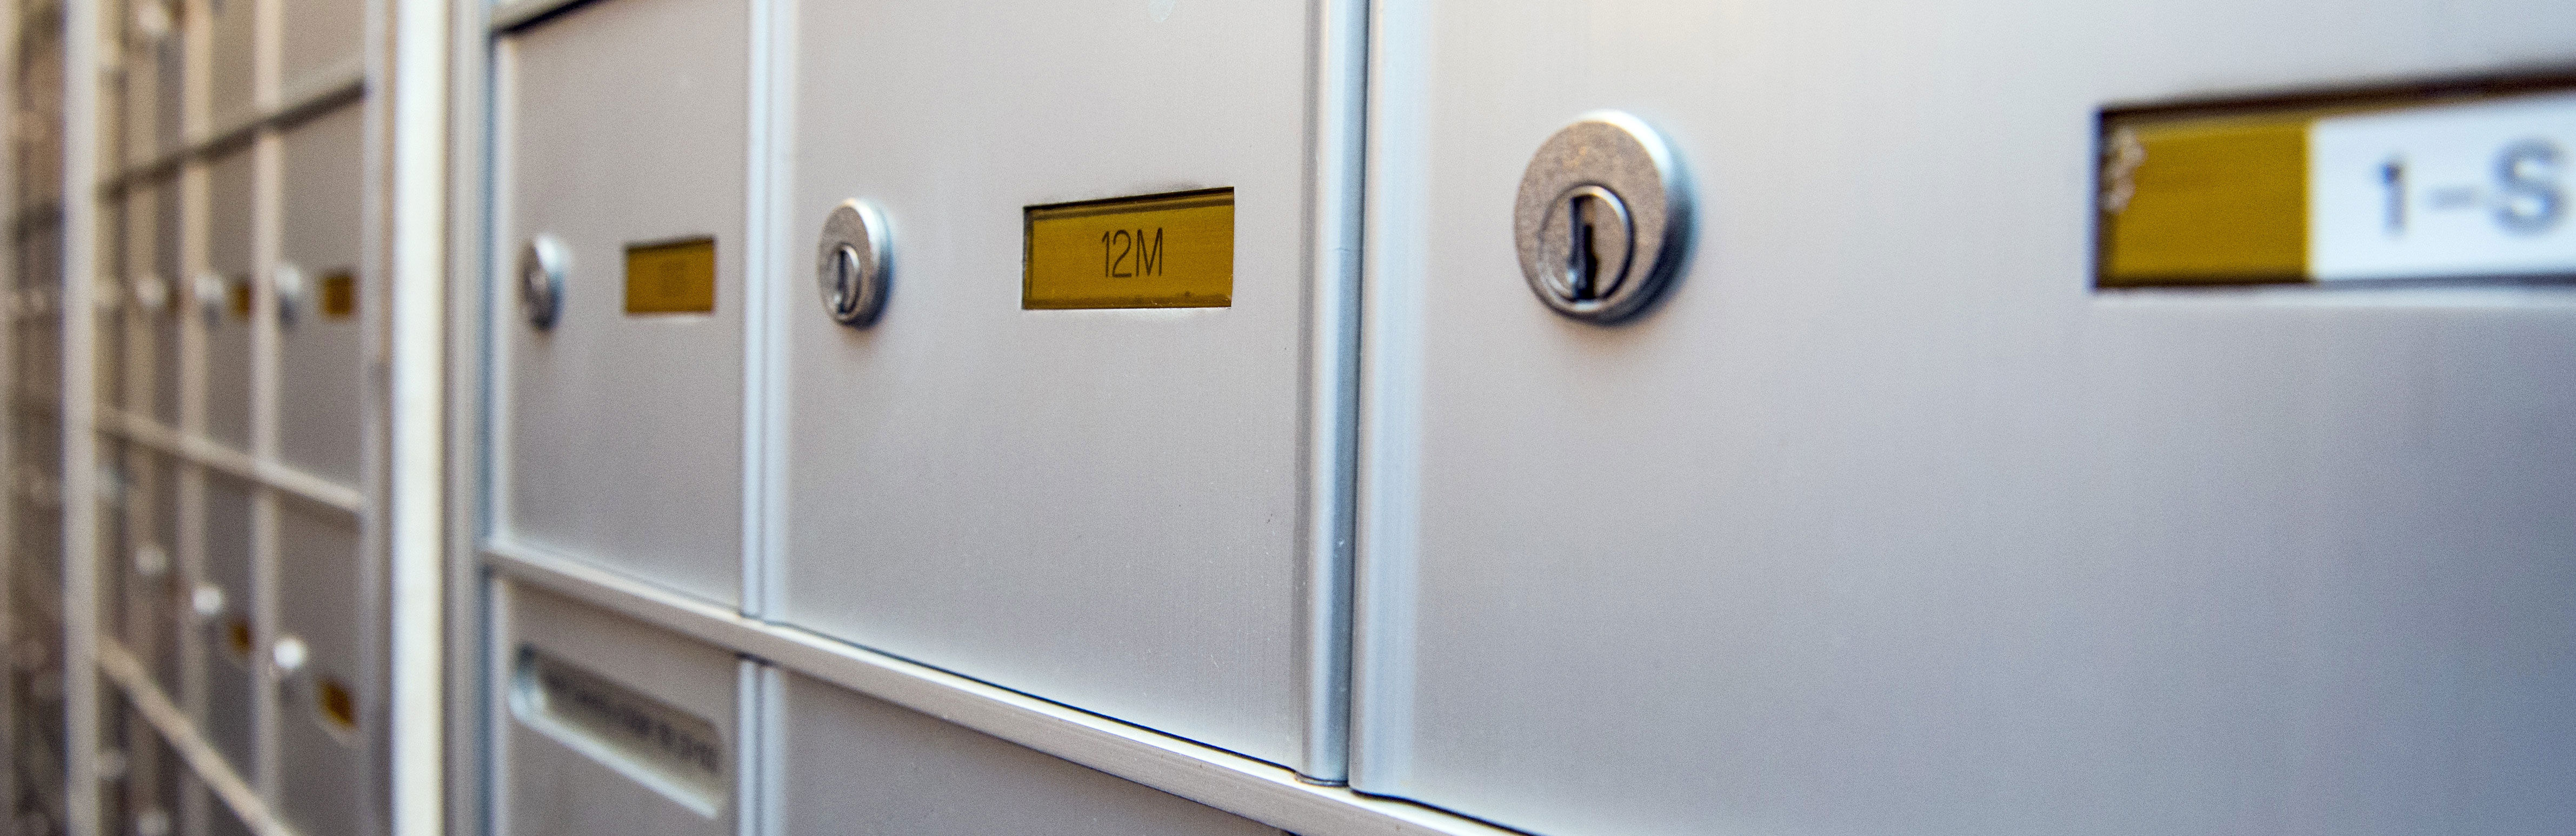 Mailboxes in Weill Cornell Medicine housing.